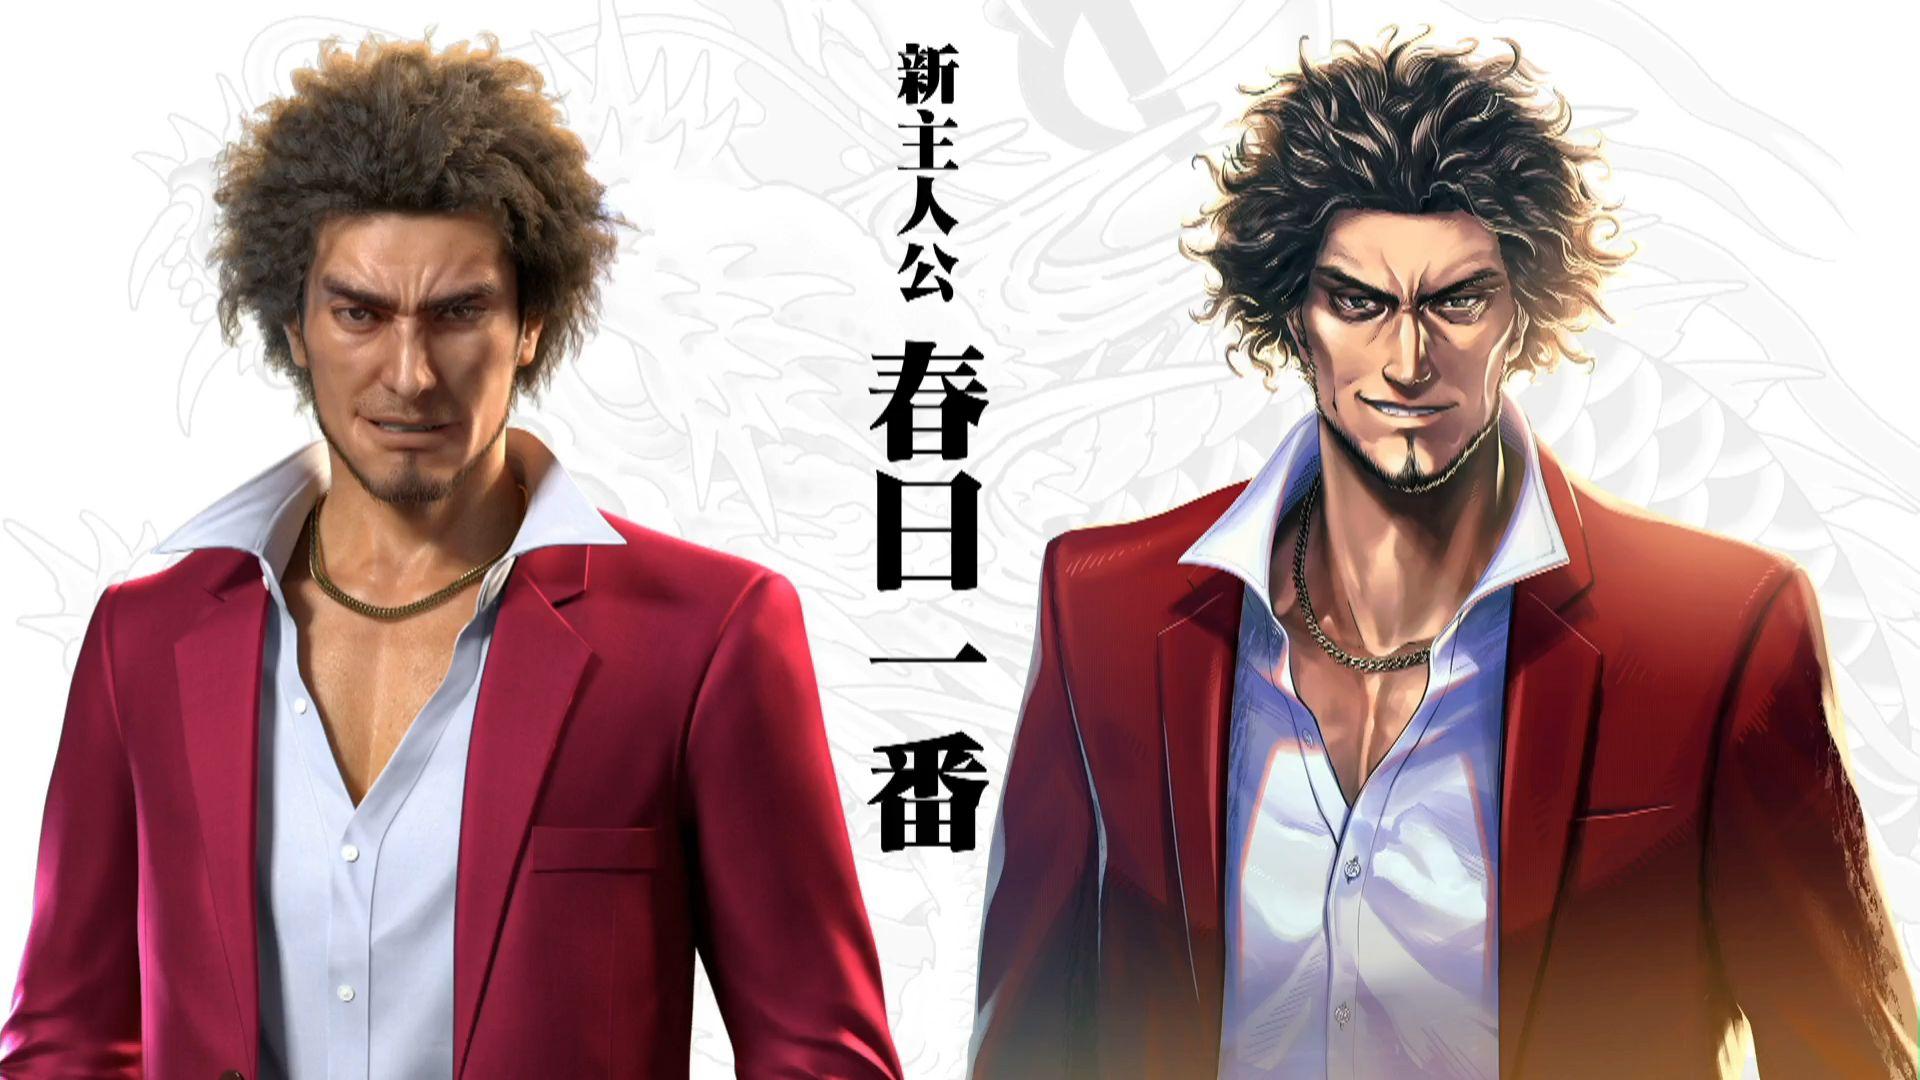 Sequência de Yakuza 6, New Yakuza é anunciado com novidades 1